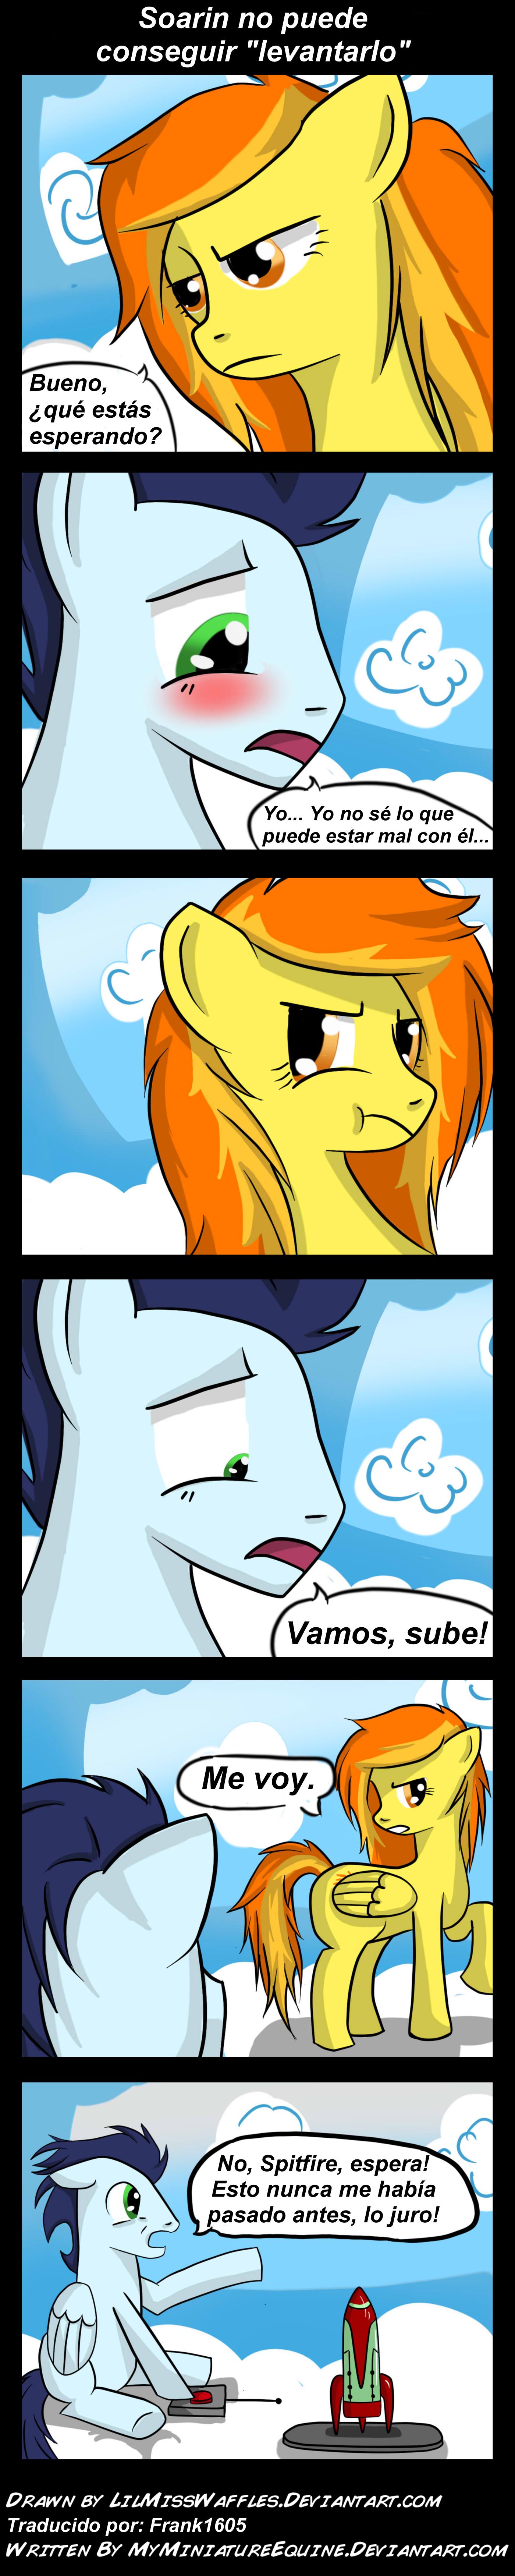 Pie Comic Cómic Cmc Pinkie Pie